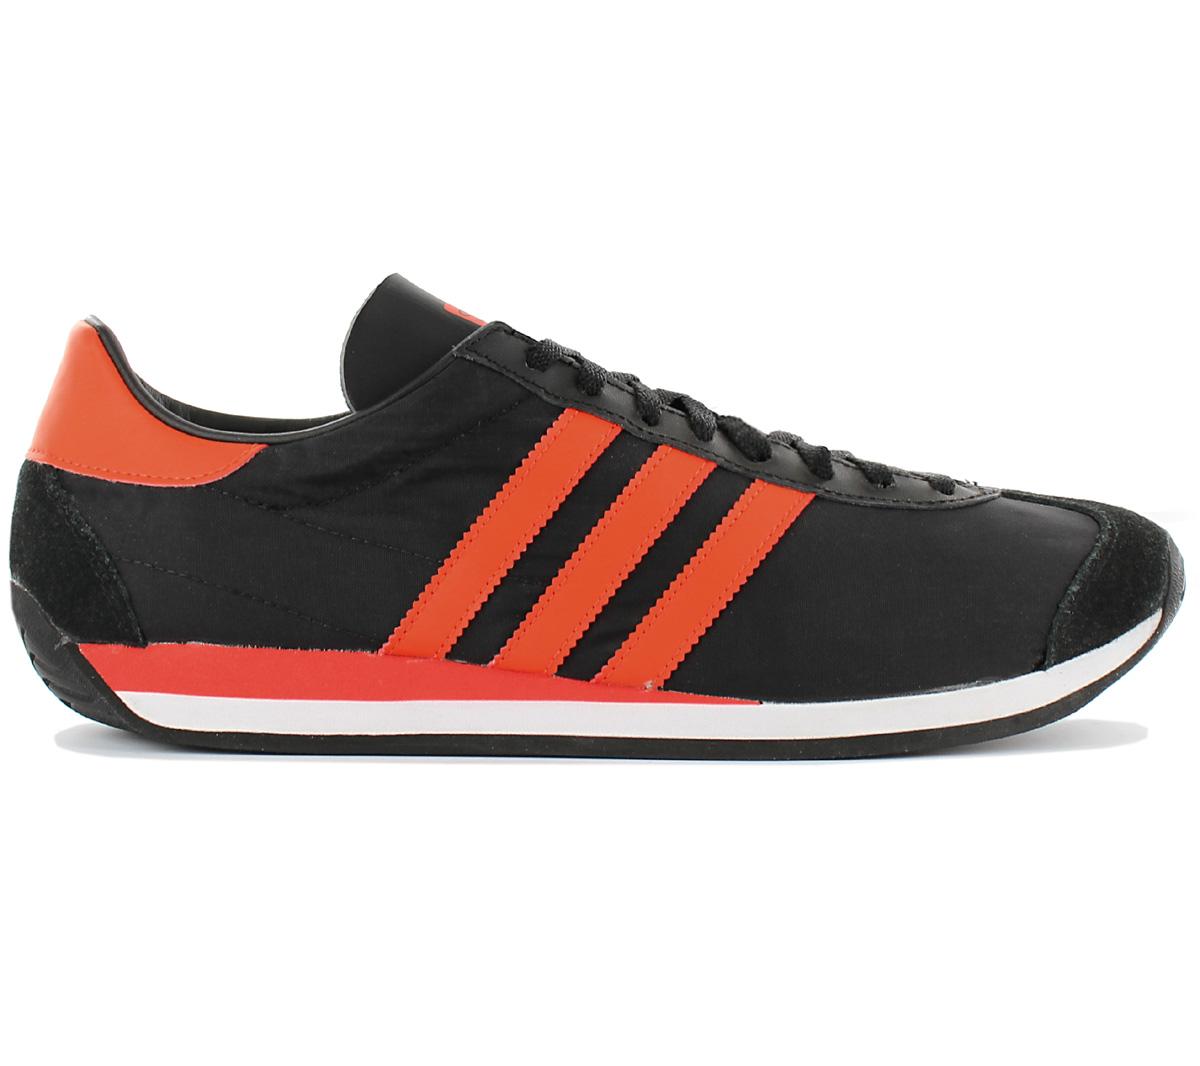 bc982832797de3 adidas Originals Country OG Herren Sneaker Retro Schuhe Turnschuhe ...